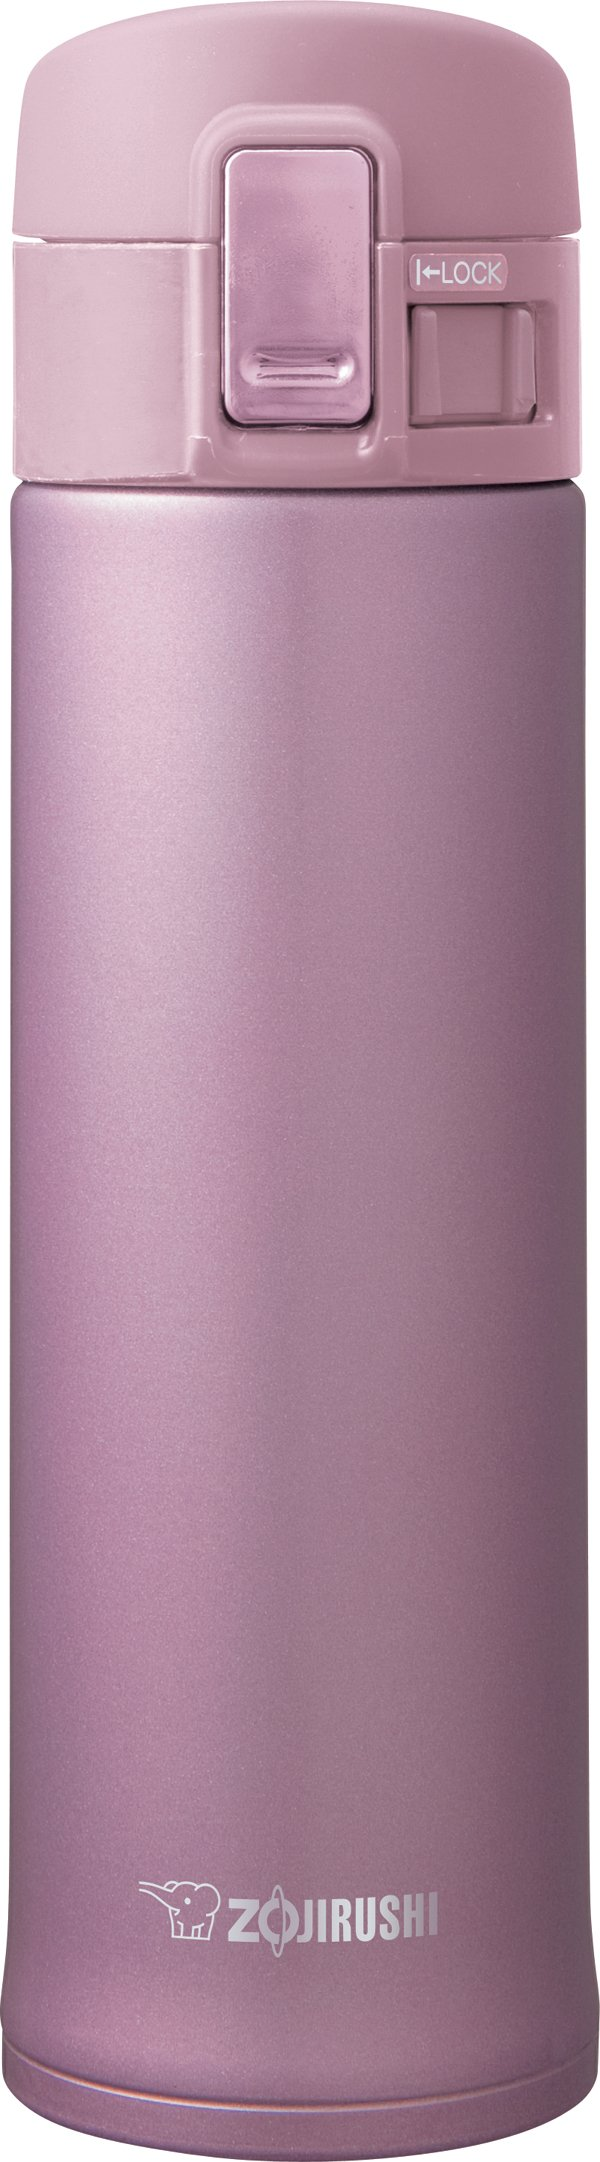 Zojirushi SM-KHE48PT Stainless Mug, 16-Ounce, Lavender Pink